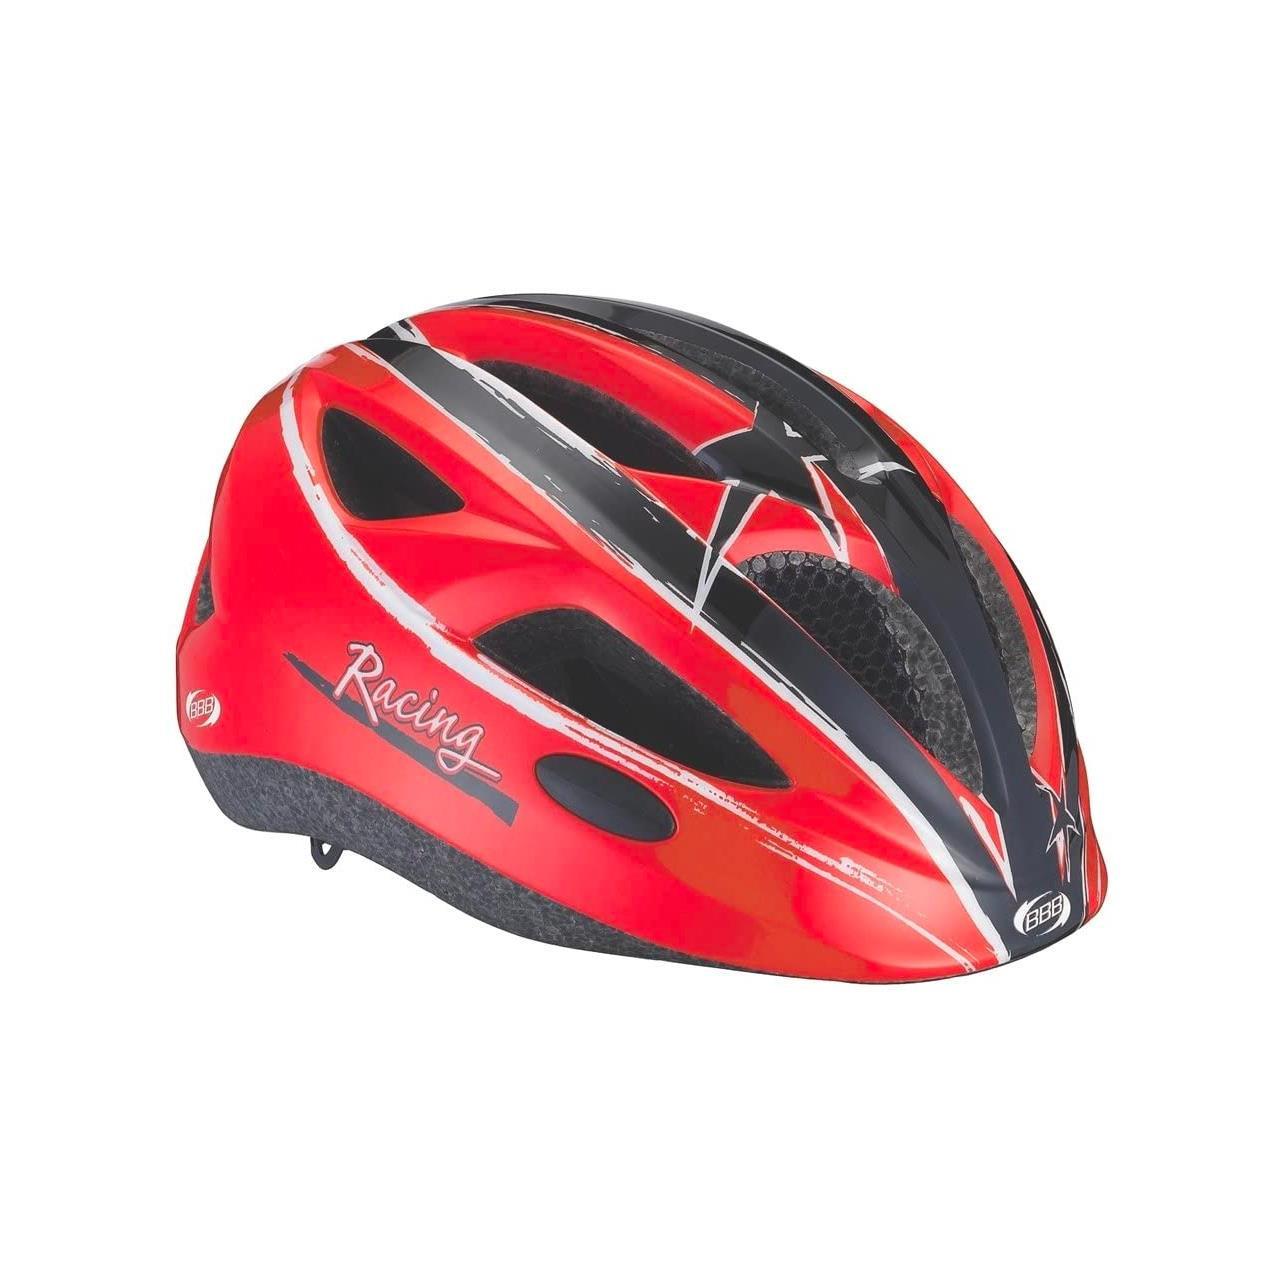 BBB Hero Helmet (Red, Medium, 51-55 cm)